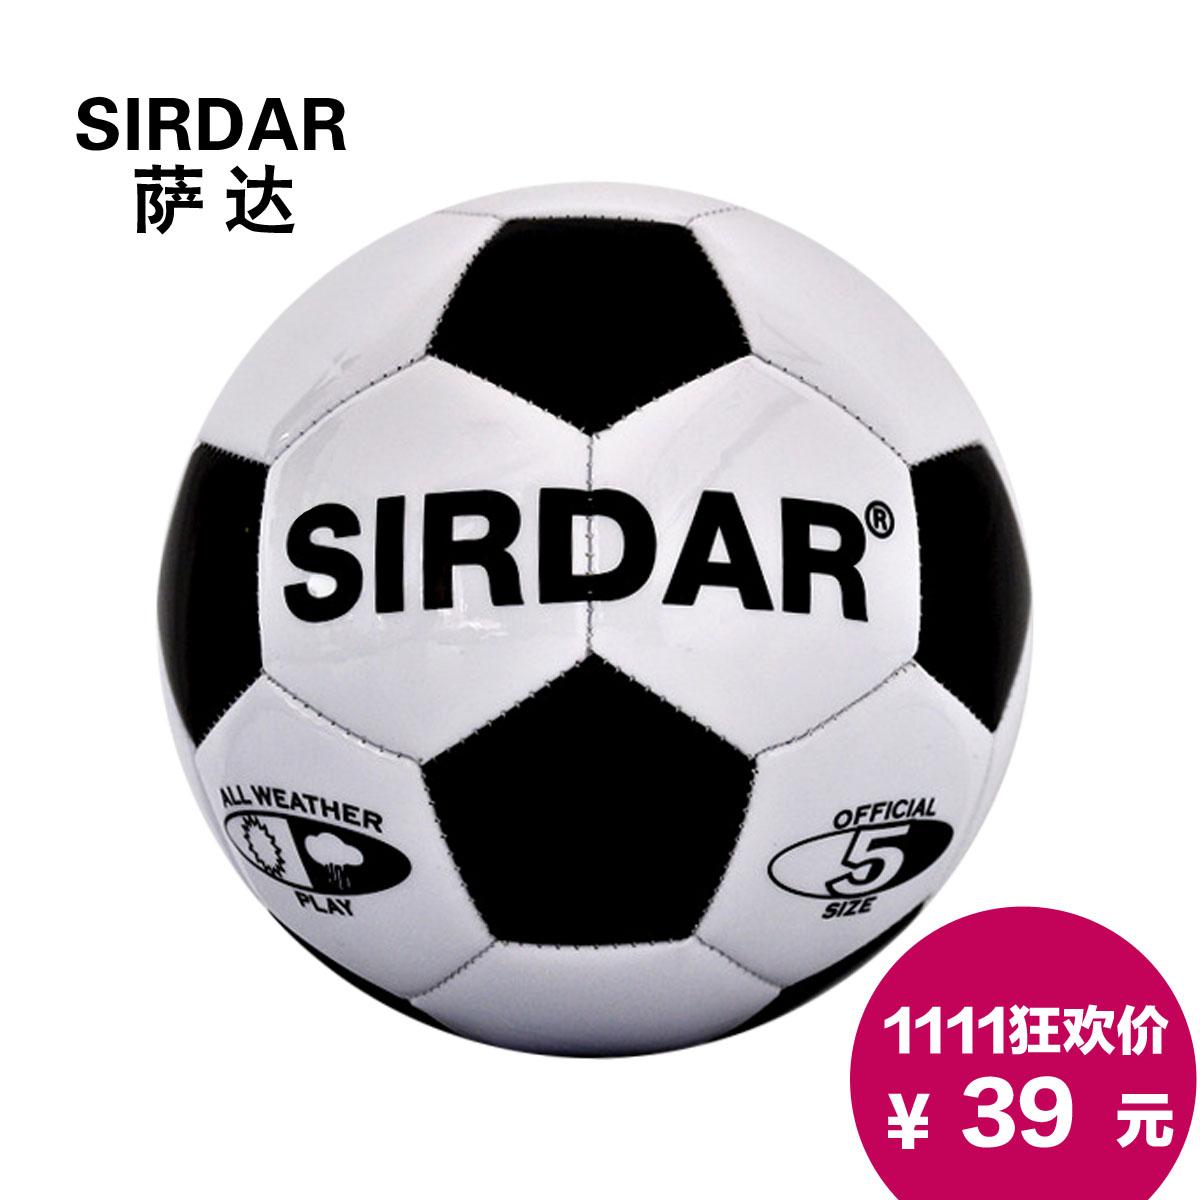 Classic black and white 5 sewing machine teenage match football(China (Mainland))